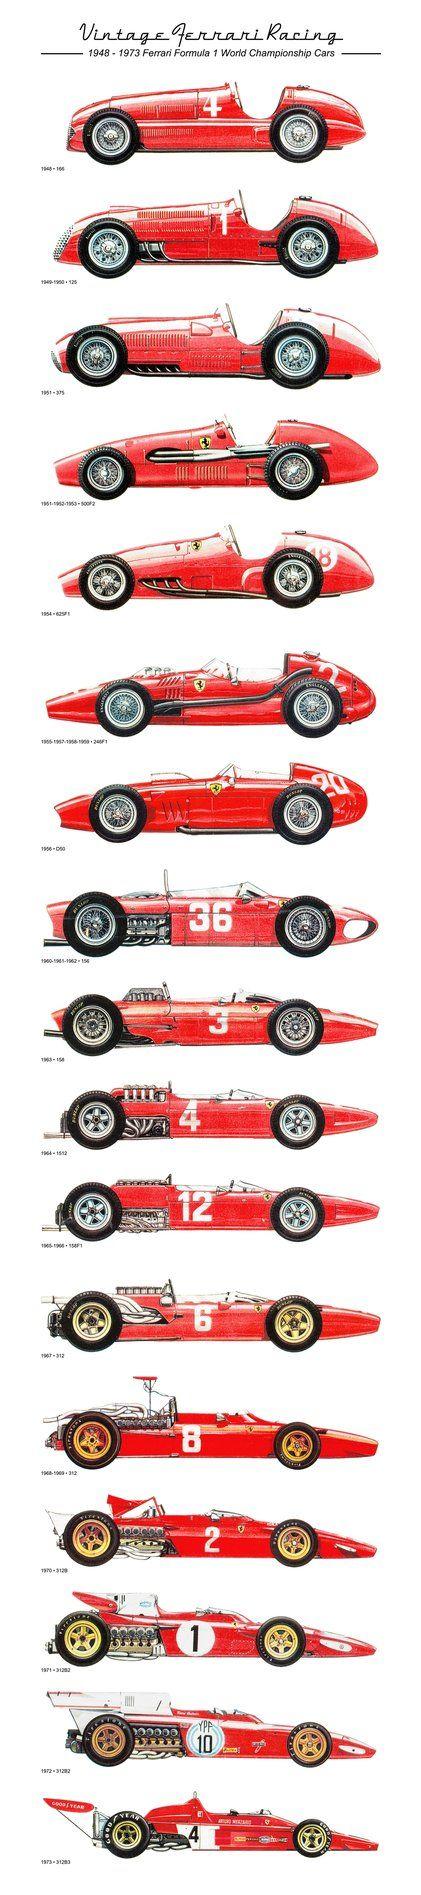 Vintage Ferrari Racing Poster by ~LGRuffa on deviantART F1 Ferraris between 1948 and 1973.